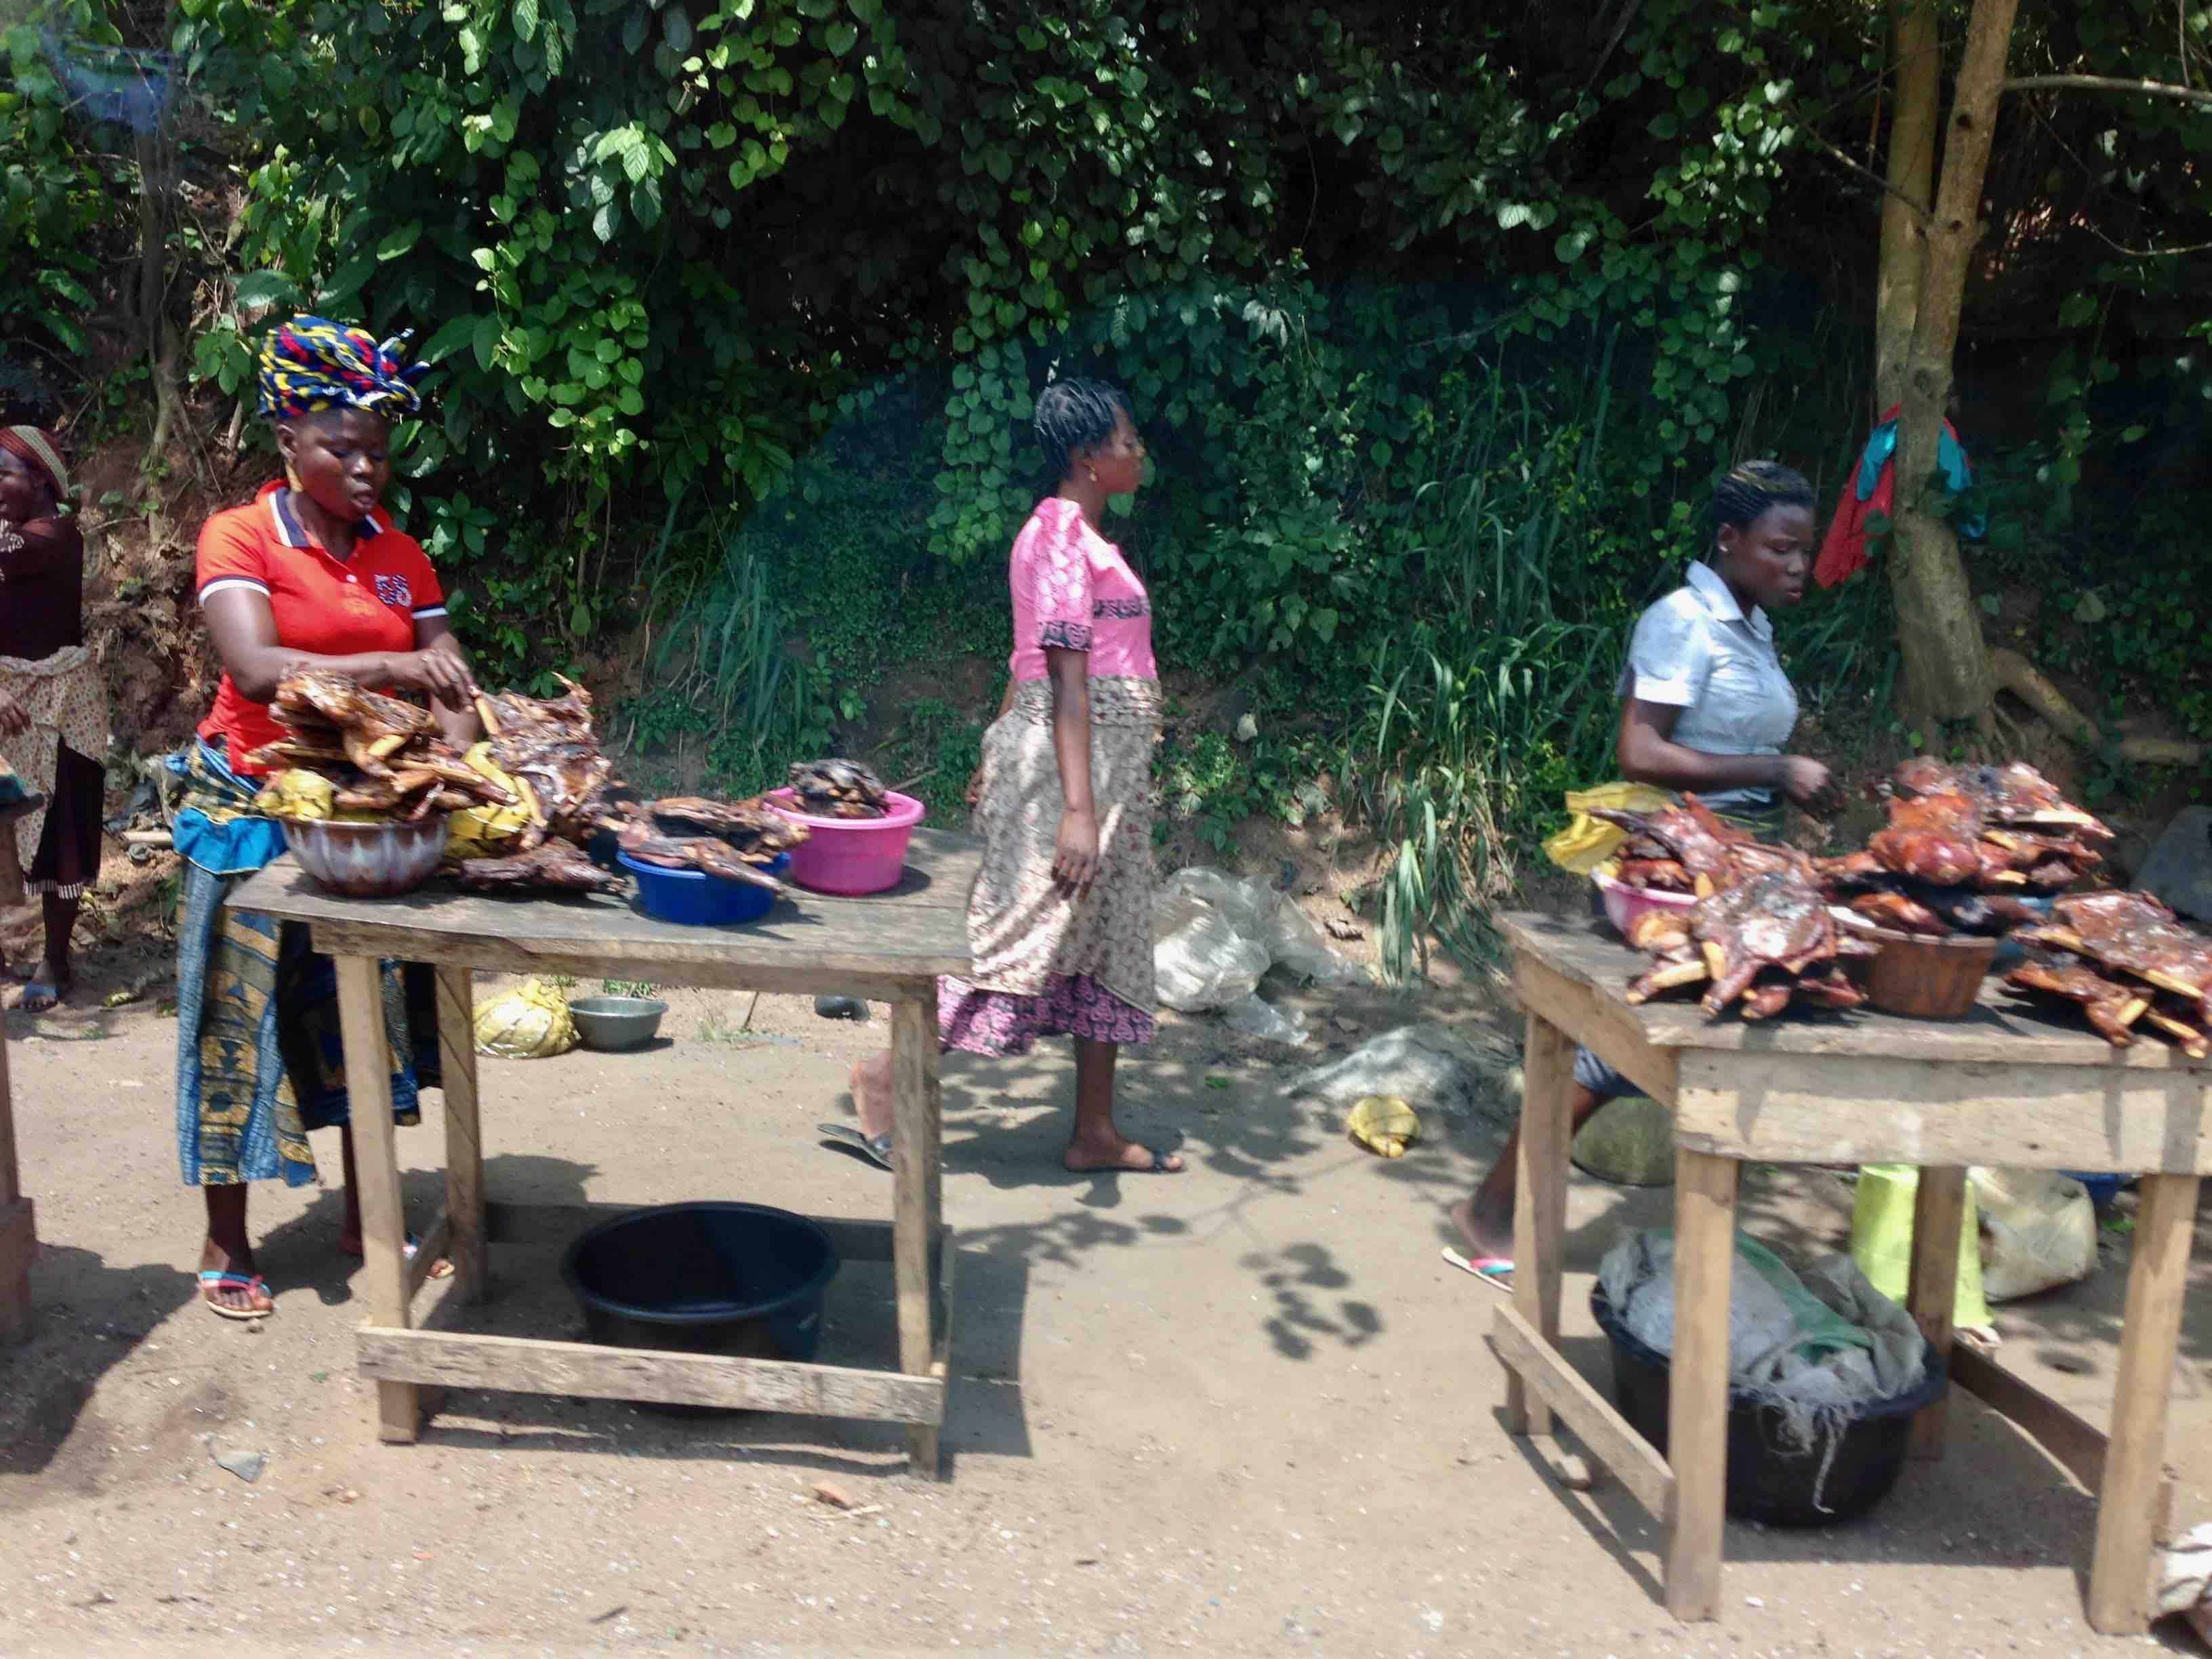 Women smoking bushmeat, Bushmeat Roadside Market, Ibadan – Ife Expressway, Osun, Nigeria. #JujuFilms